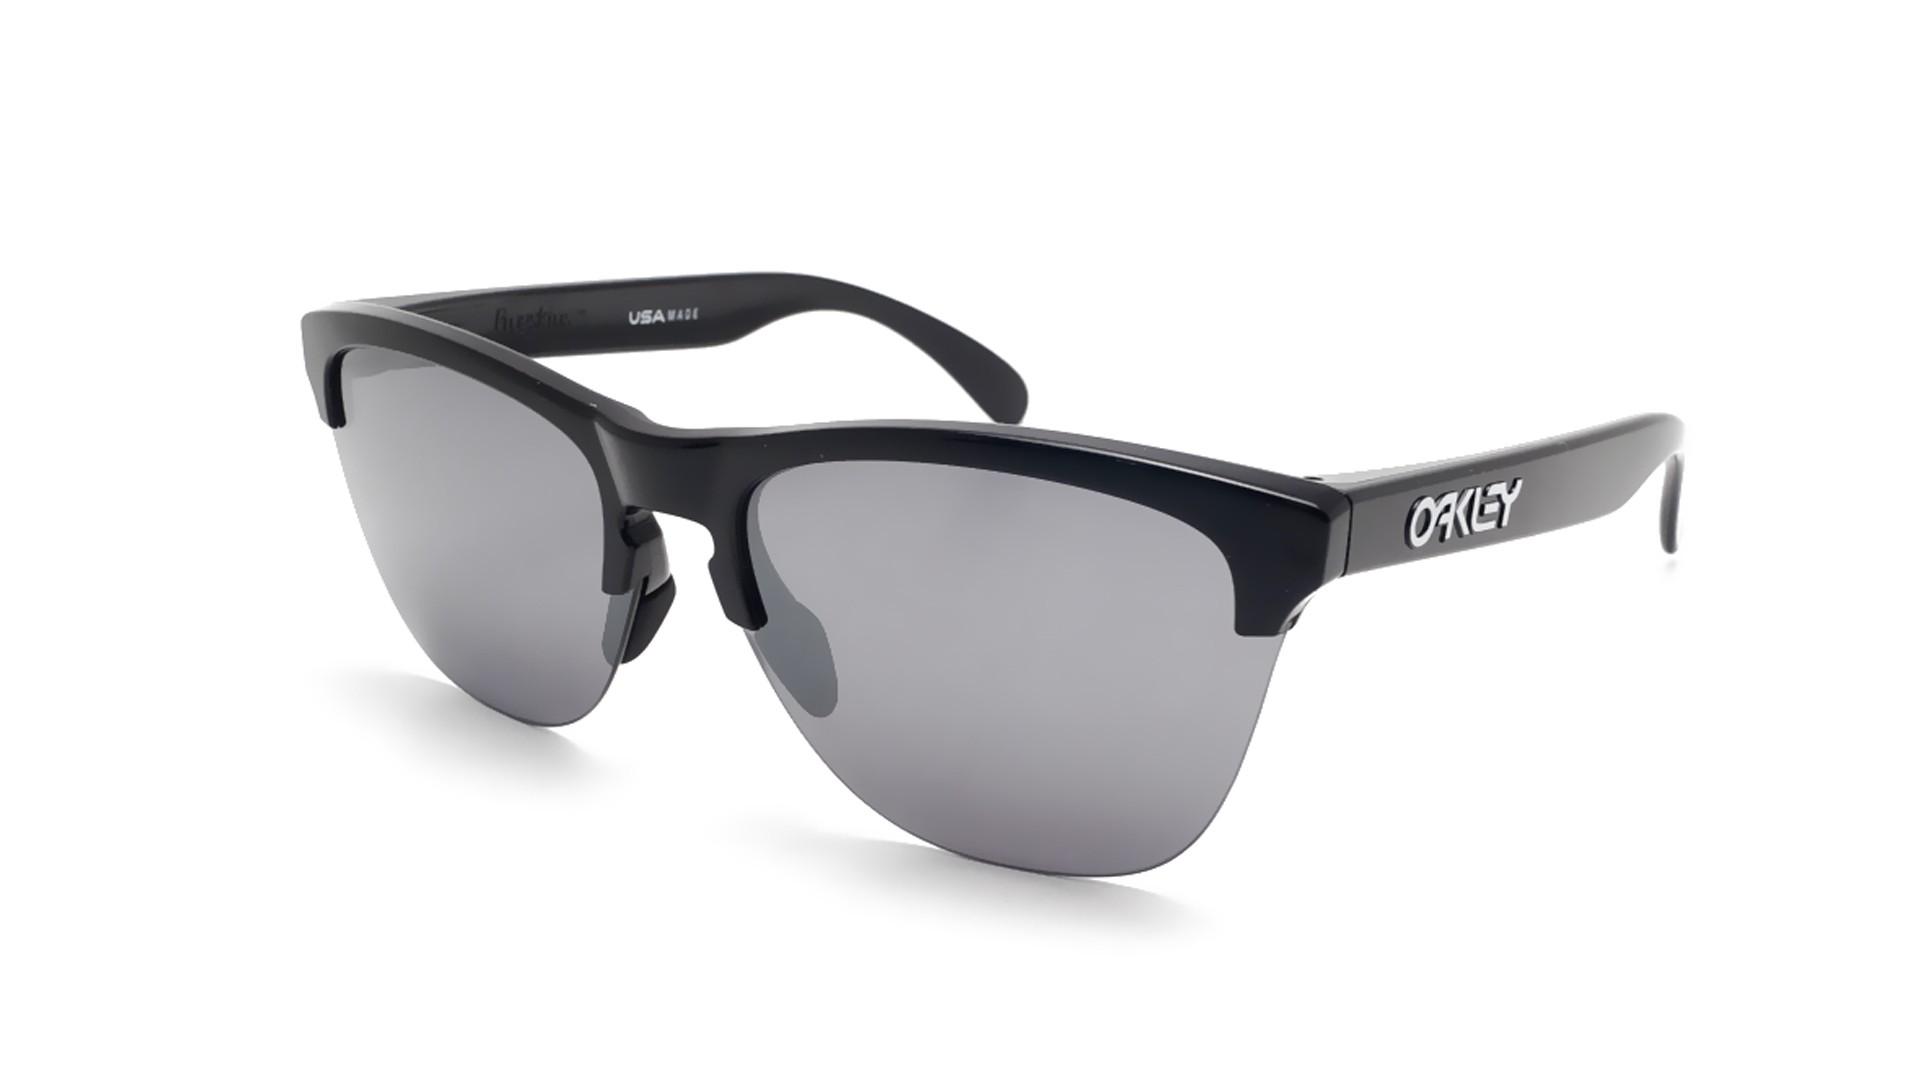 387b400c90 Sunglasses Oakley Frogskins Lite Black Prizm OO9374 10 63-10 Large Flash